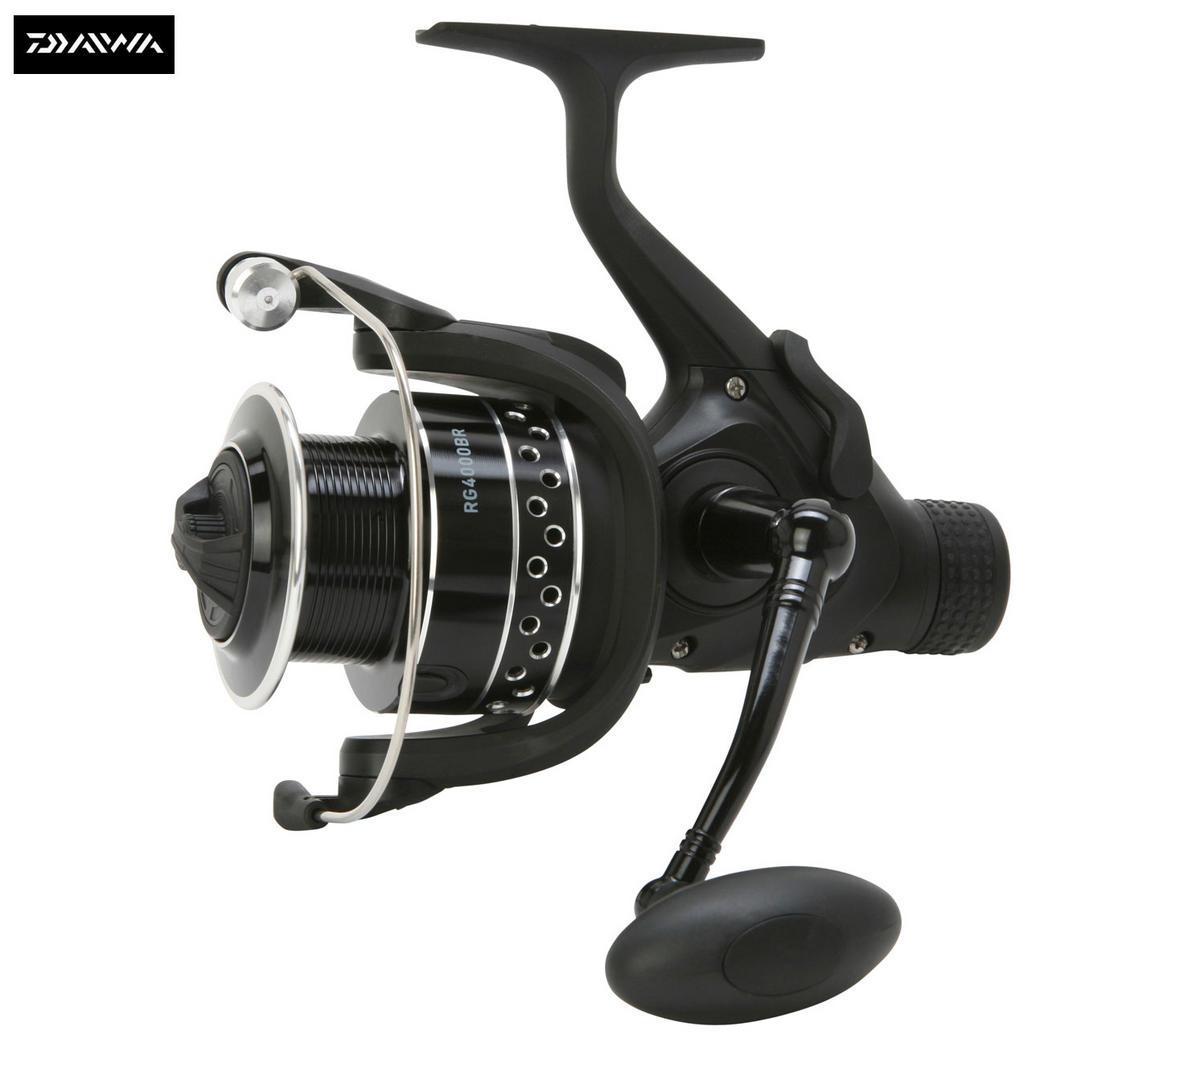 New Daiwa RG4000BR Bite N Run Carp & Coarse Fishing Reel - RG4000BR